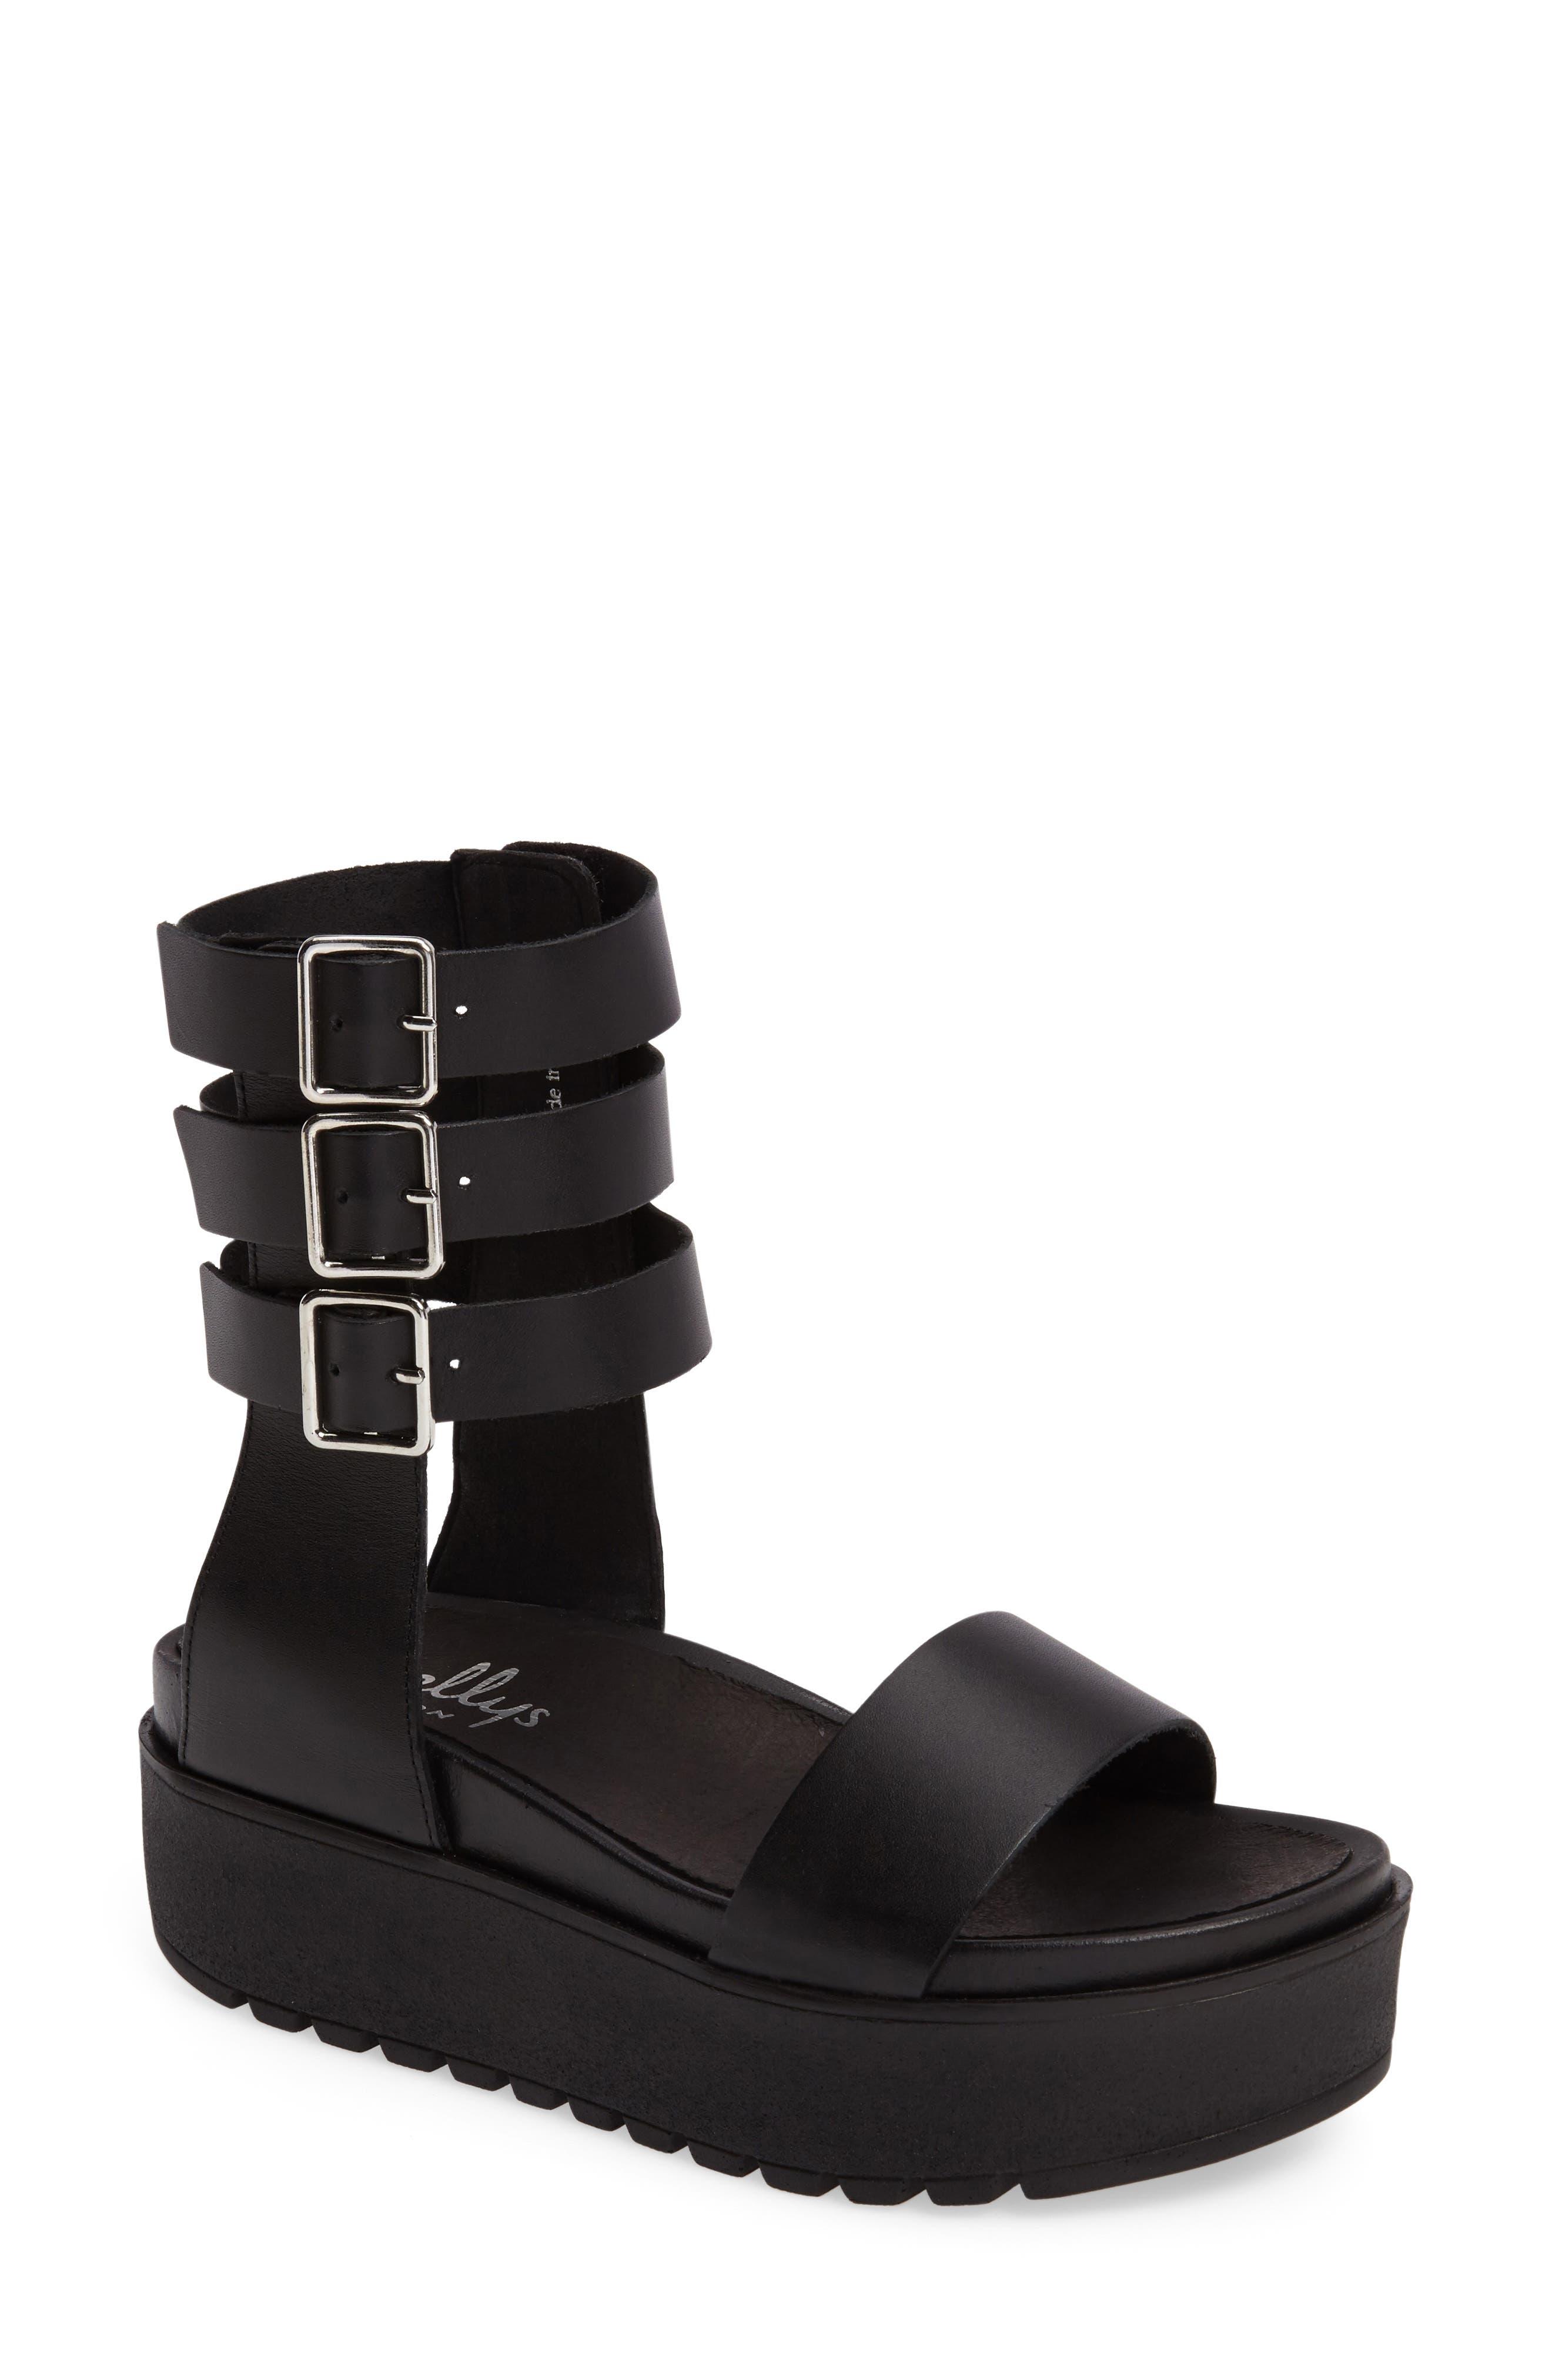 Alternate Image 1 Selected - Shellys London Kegan Platform Gladiator Sandal (Women)